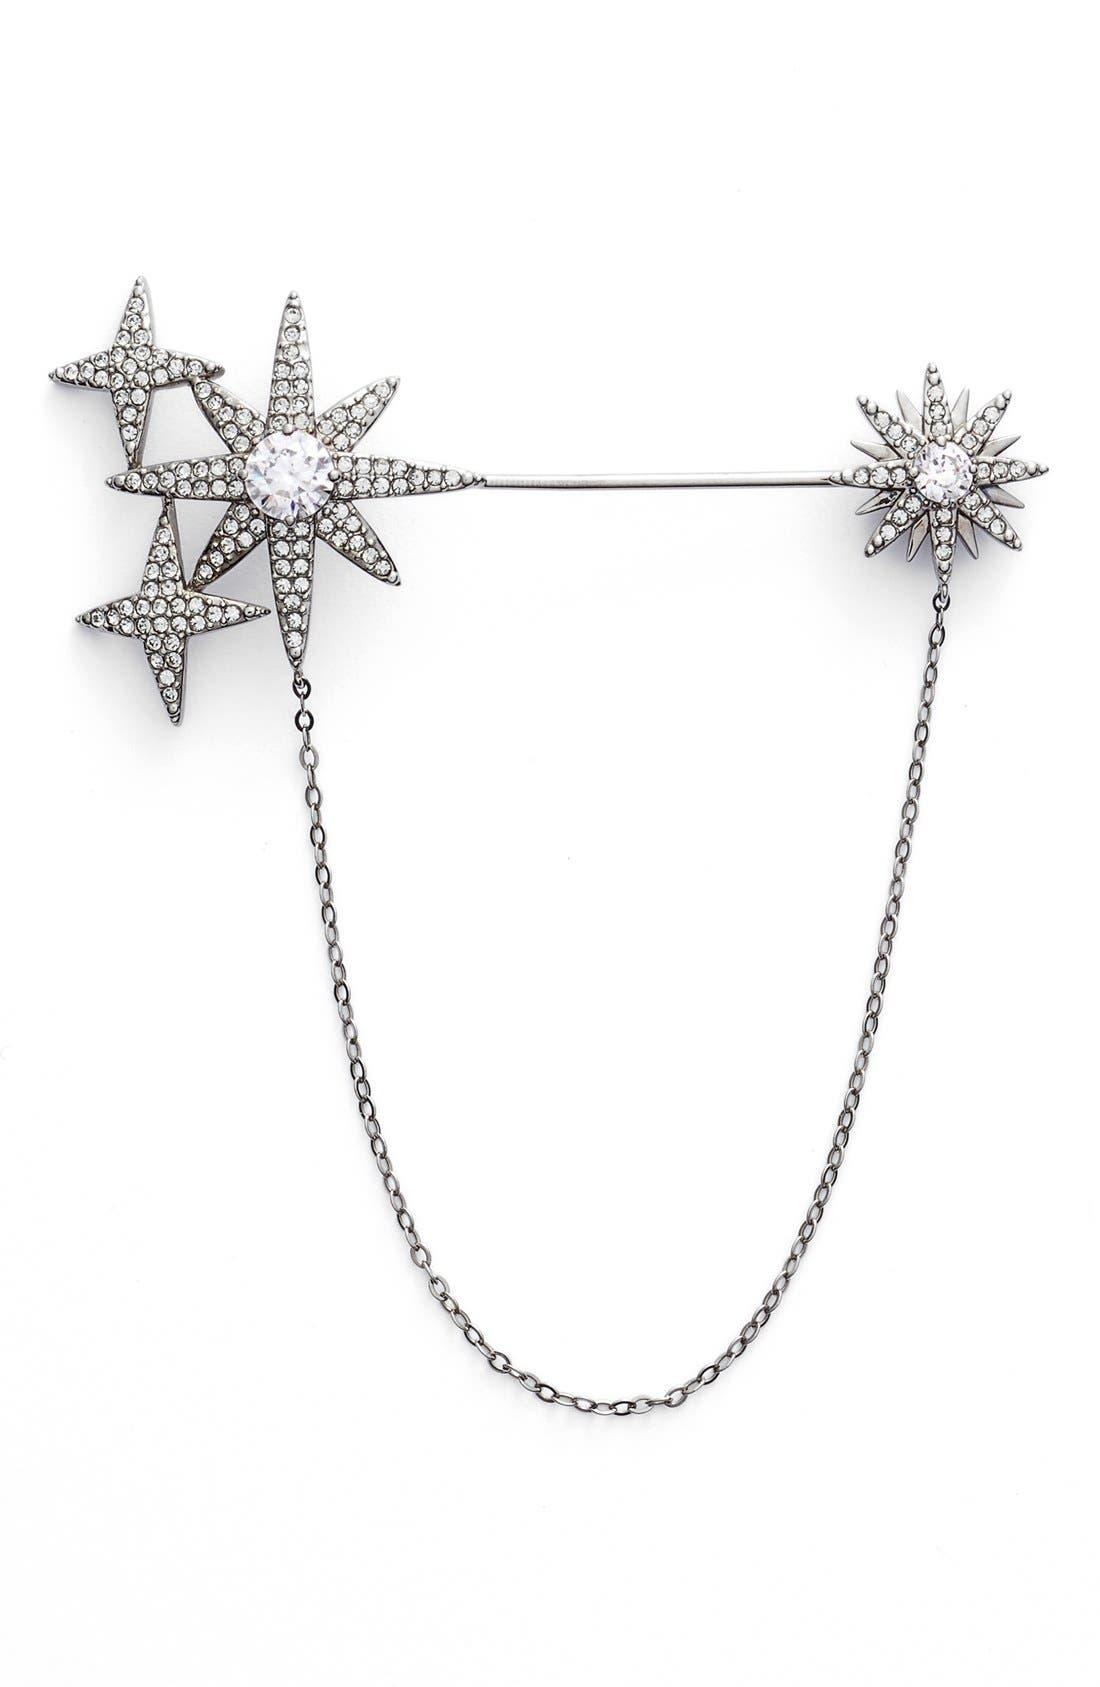 Alternate Image 1 Selected - Nadri Stardust Cubic Zirconia Brooch